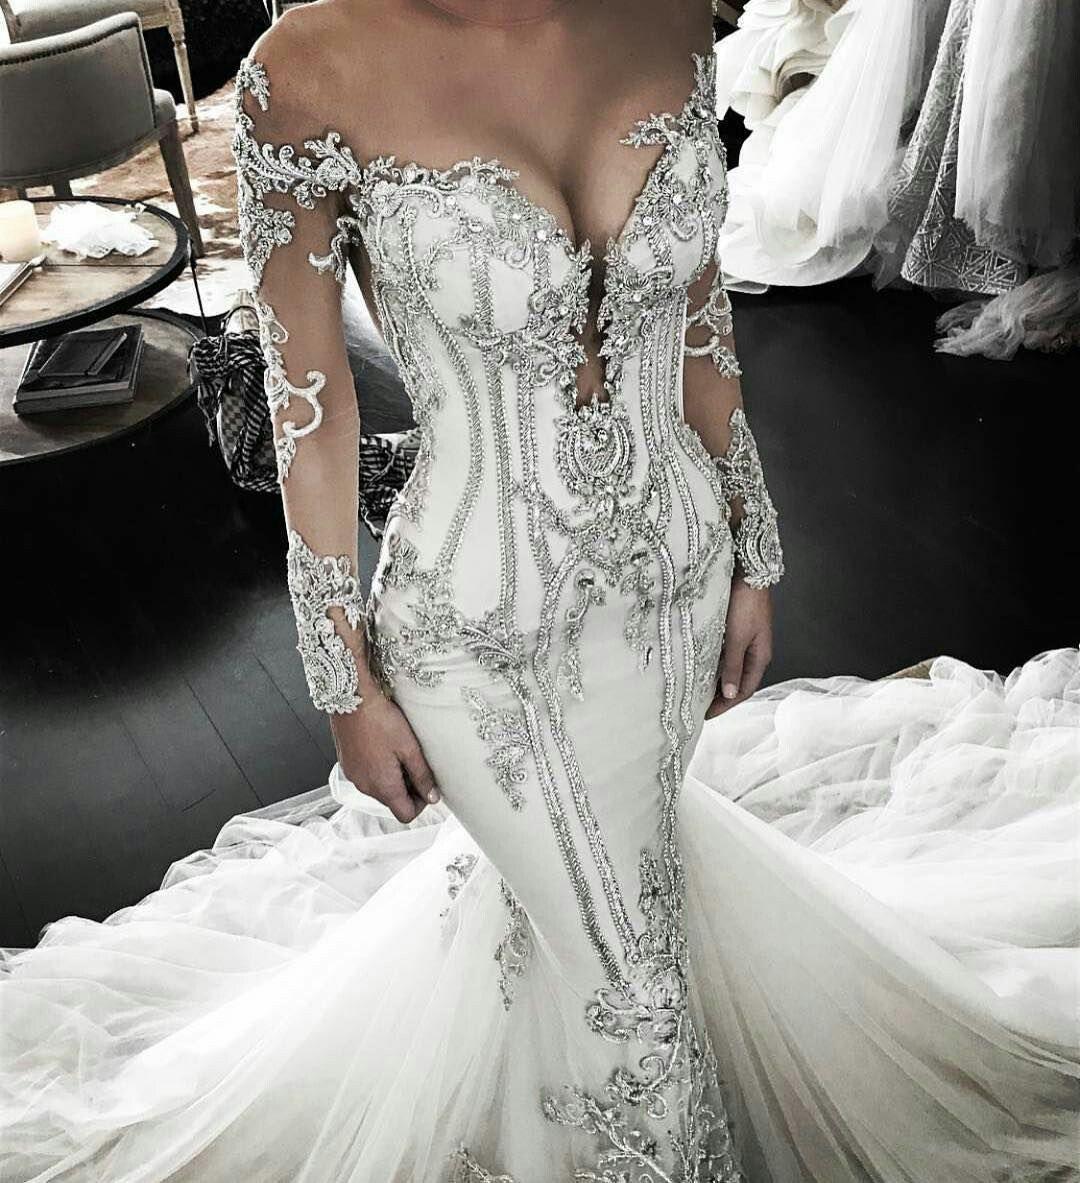 2018 Langarm Meerjungfrau Brautkleider Bling Kristall Perlen Luxus Plus Size Brautkleid Sweep Zug Sheer Jewel Neck Vestido De Novia